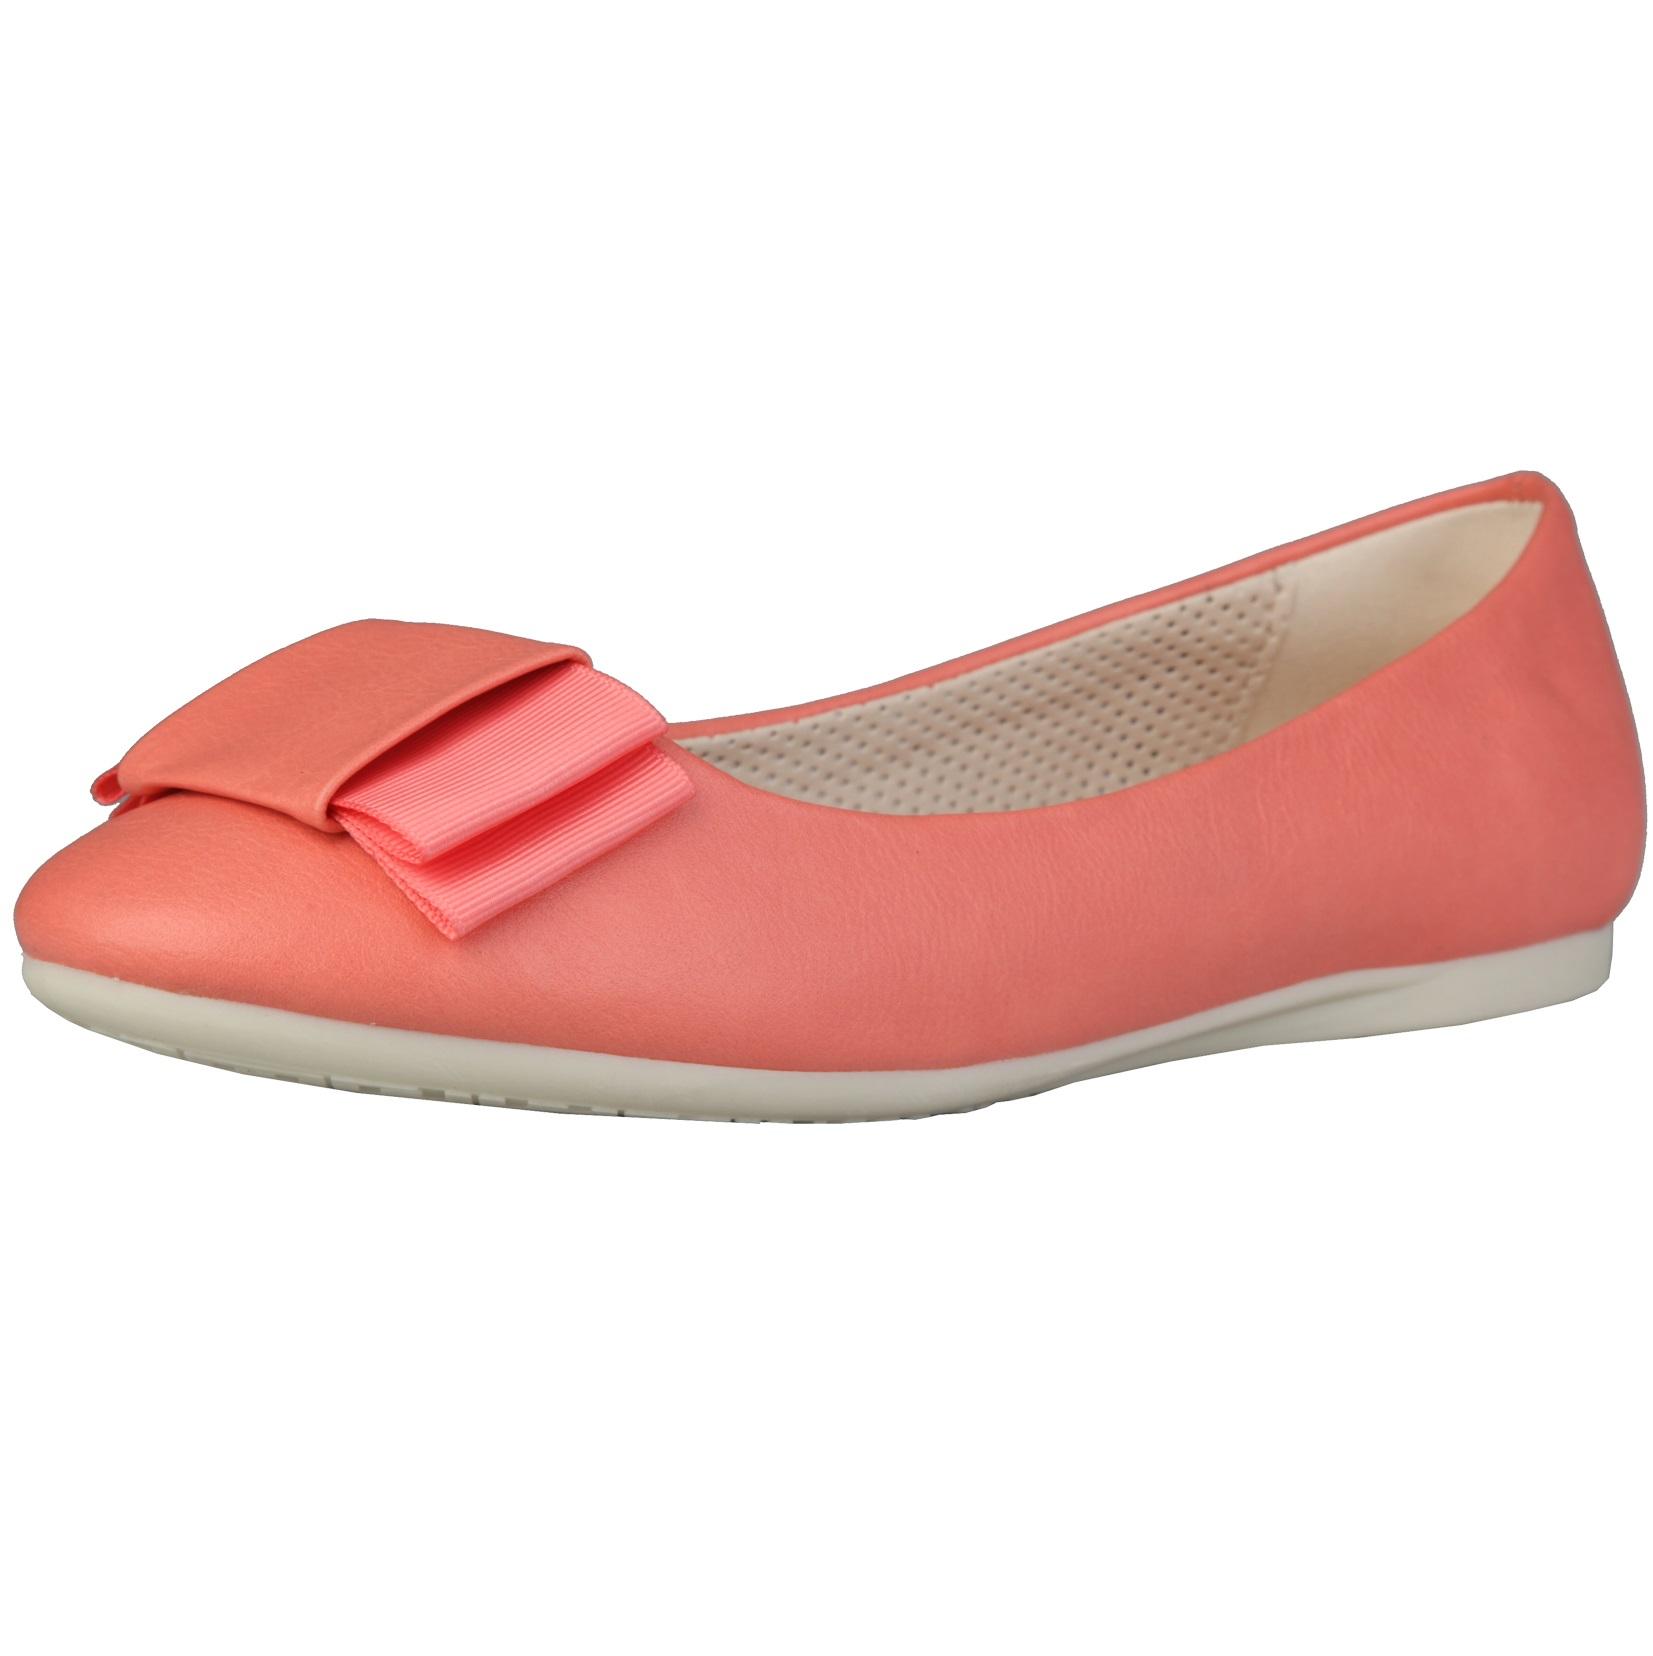 Sofia Loes Flat Shoes Fiocco Rosa Rf600155